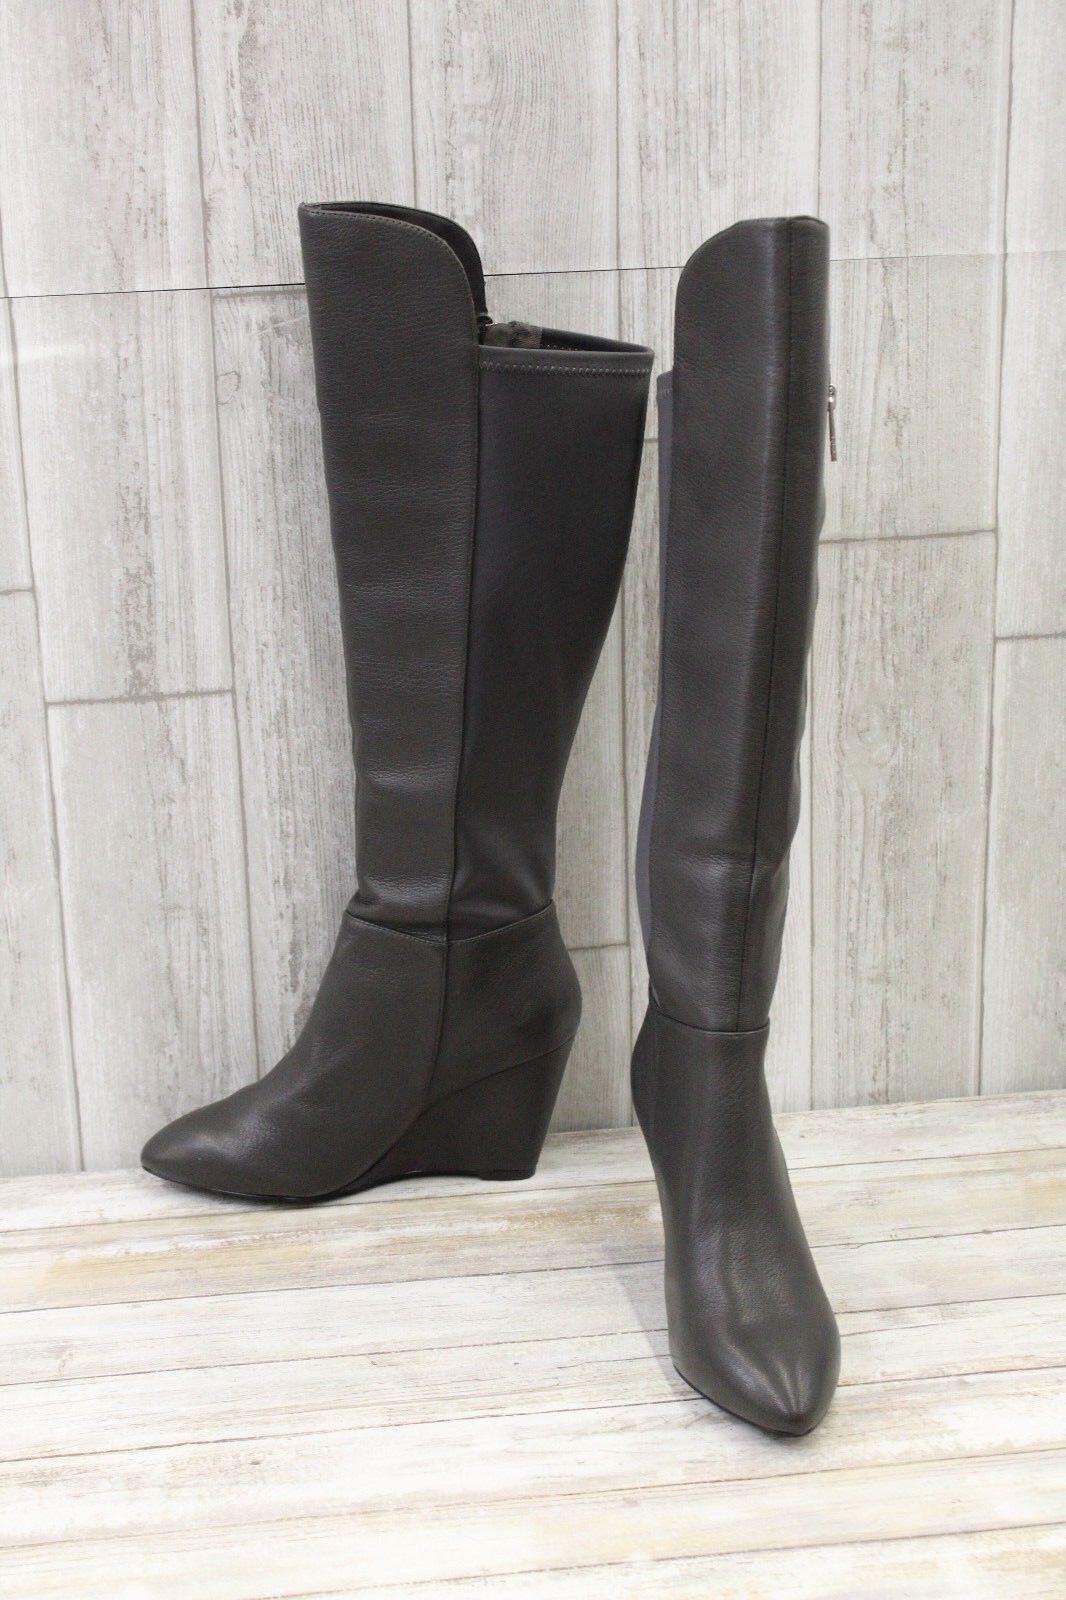 Charles by Charles David Ebony Boot - Women's Size 7.5 M, Stingrey